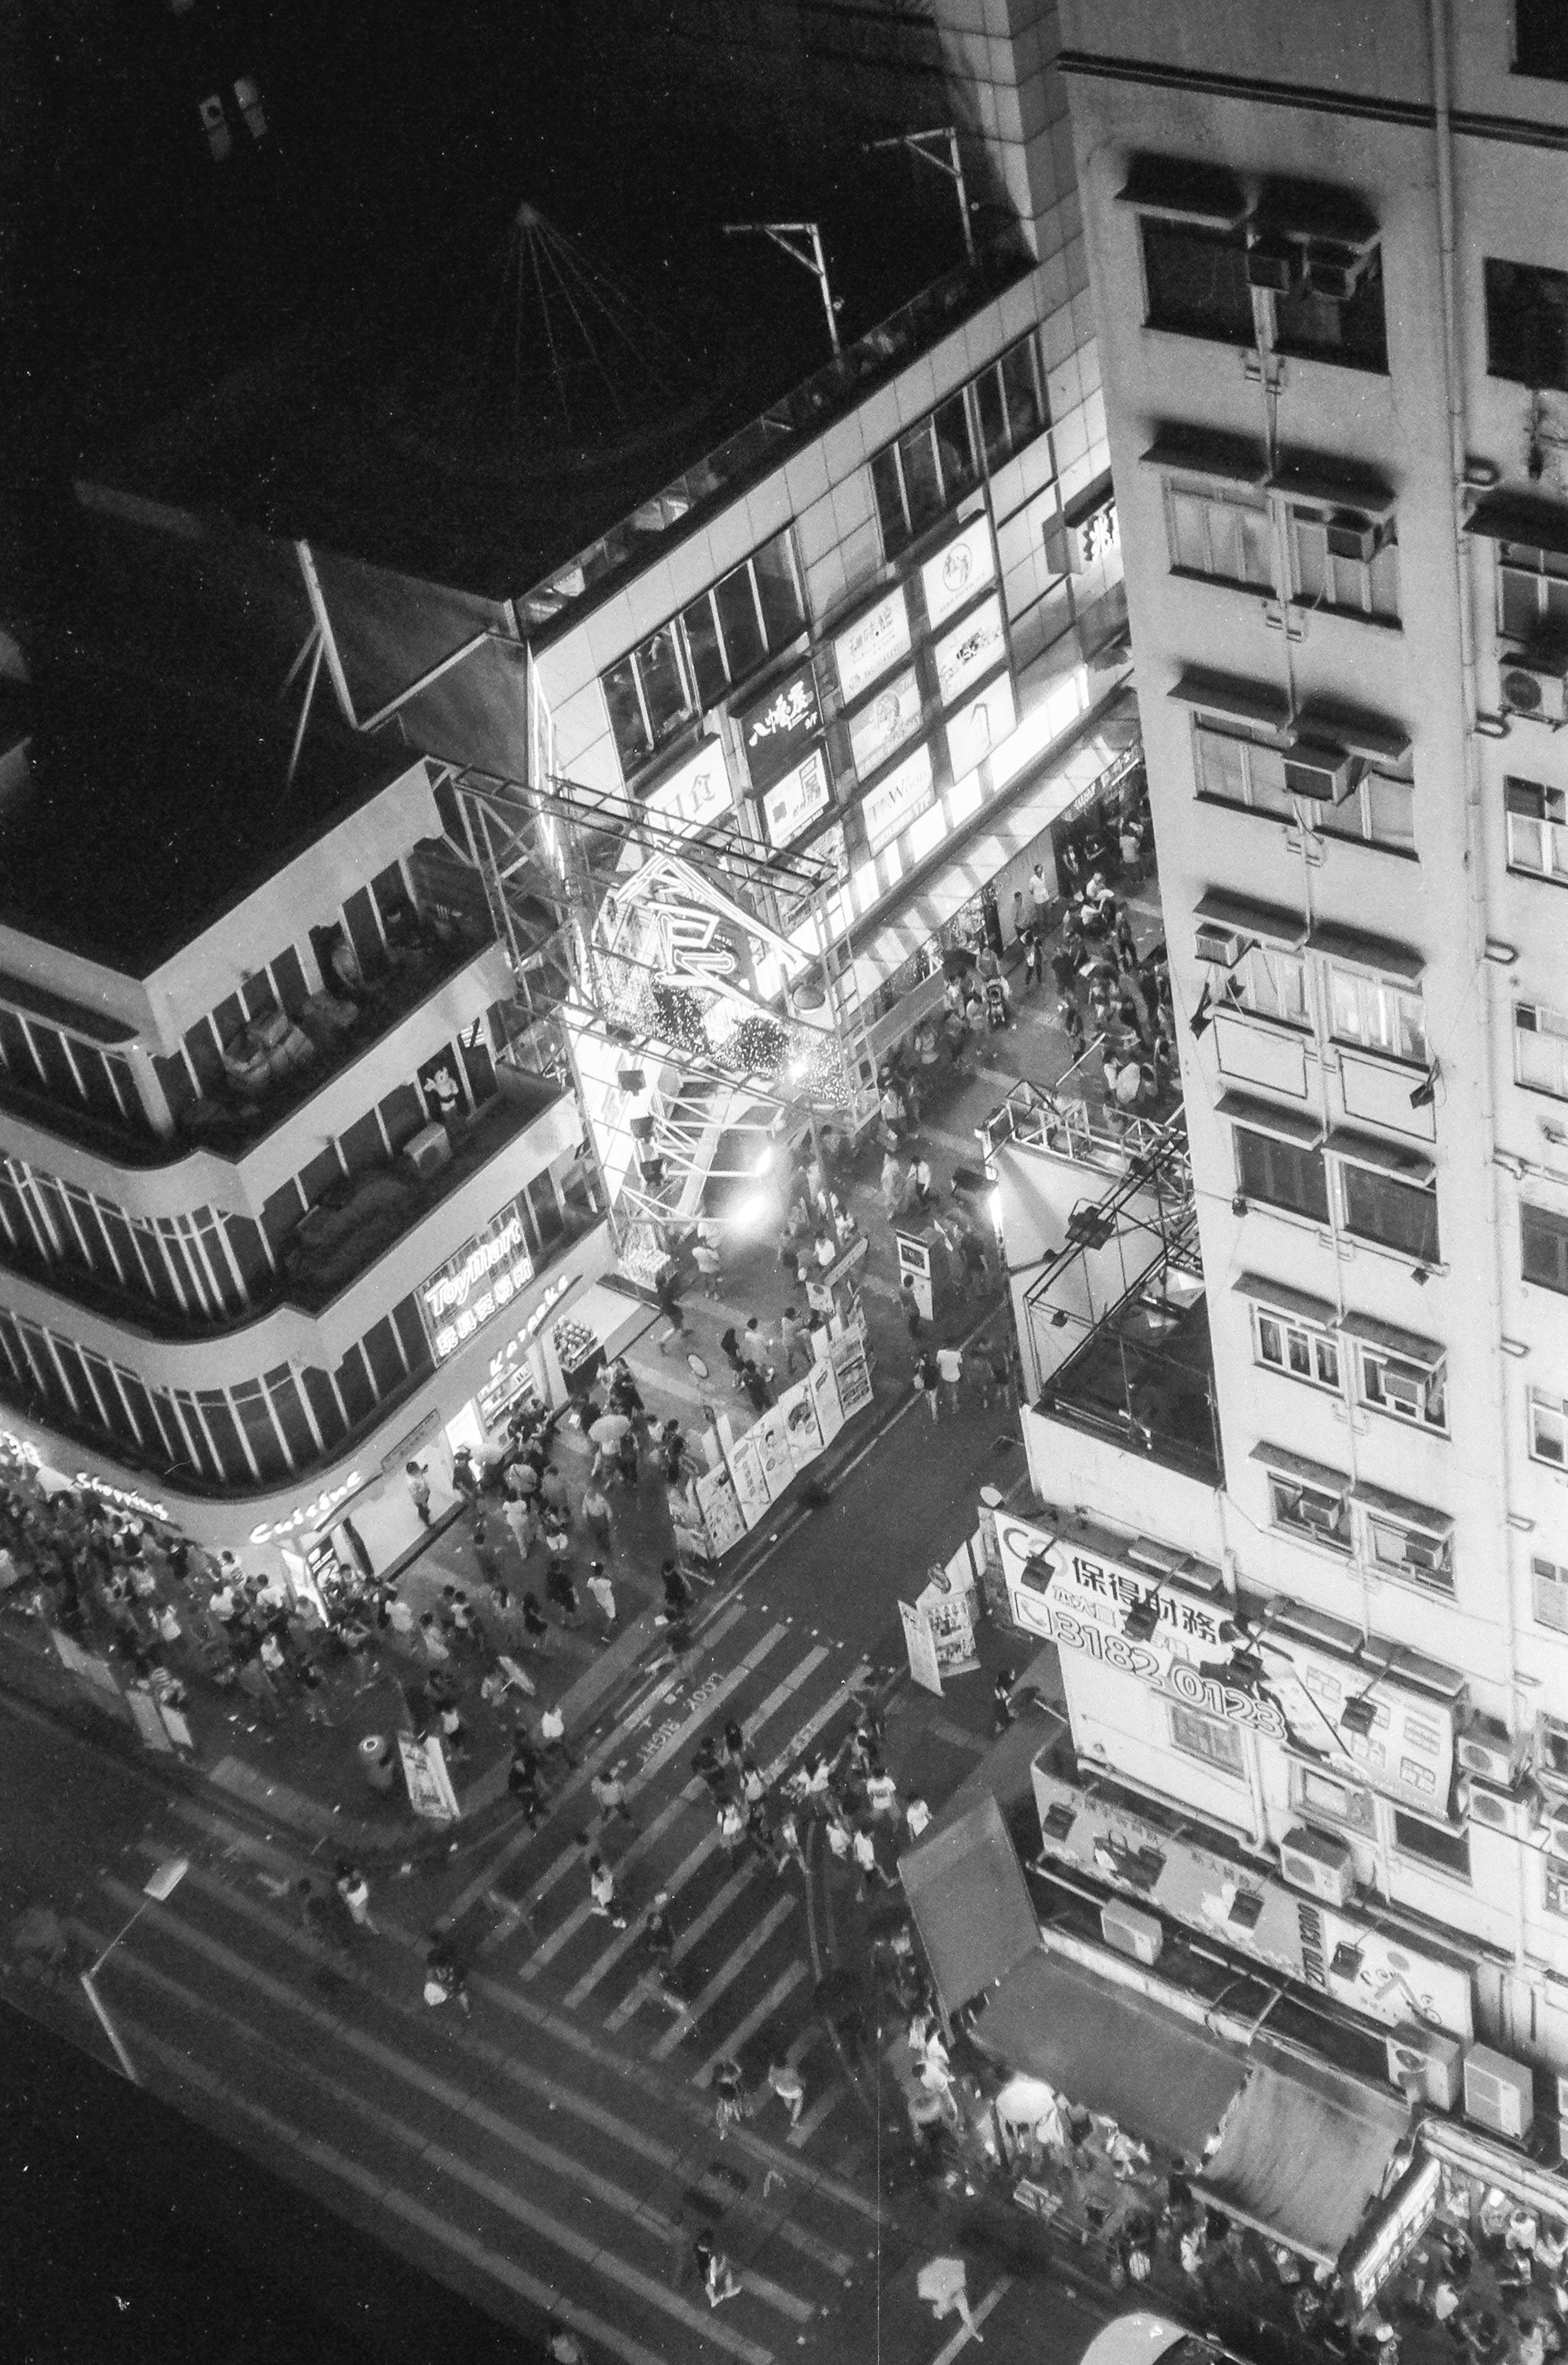 Free stock photo of analog, Analogue, Asian, black and white